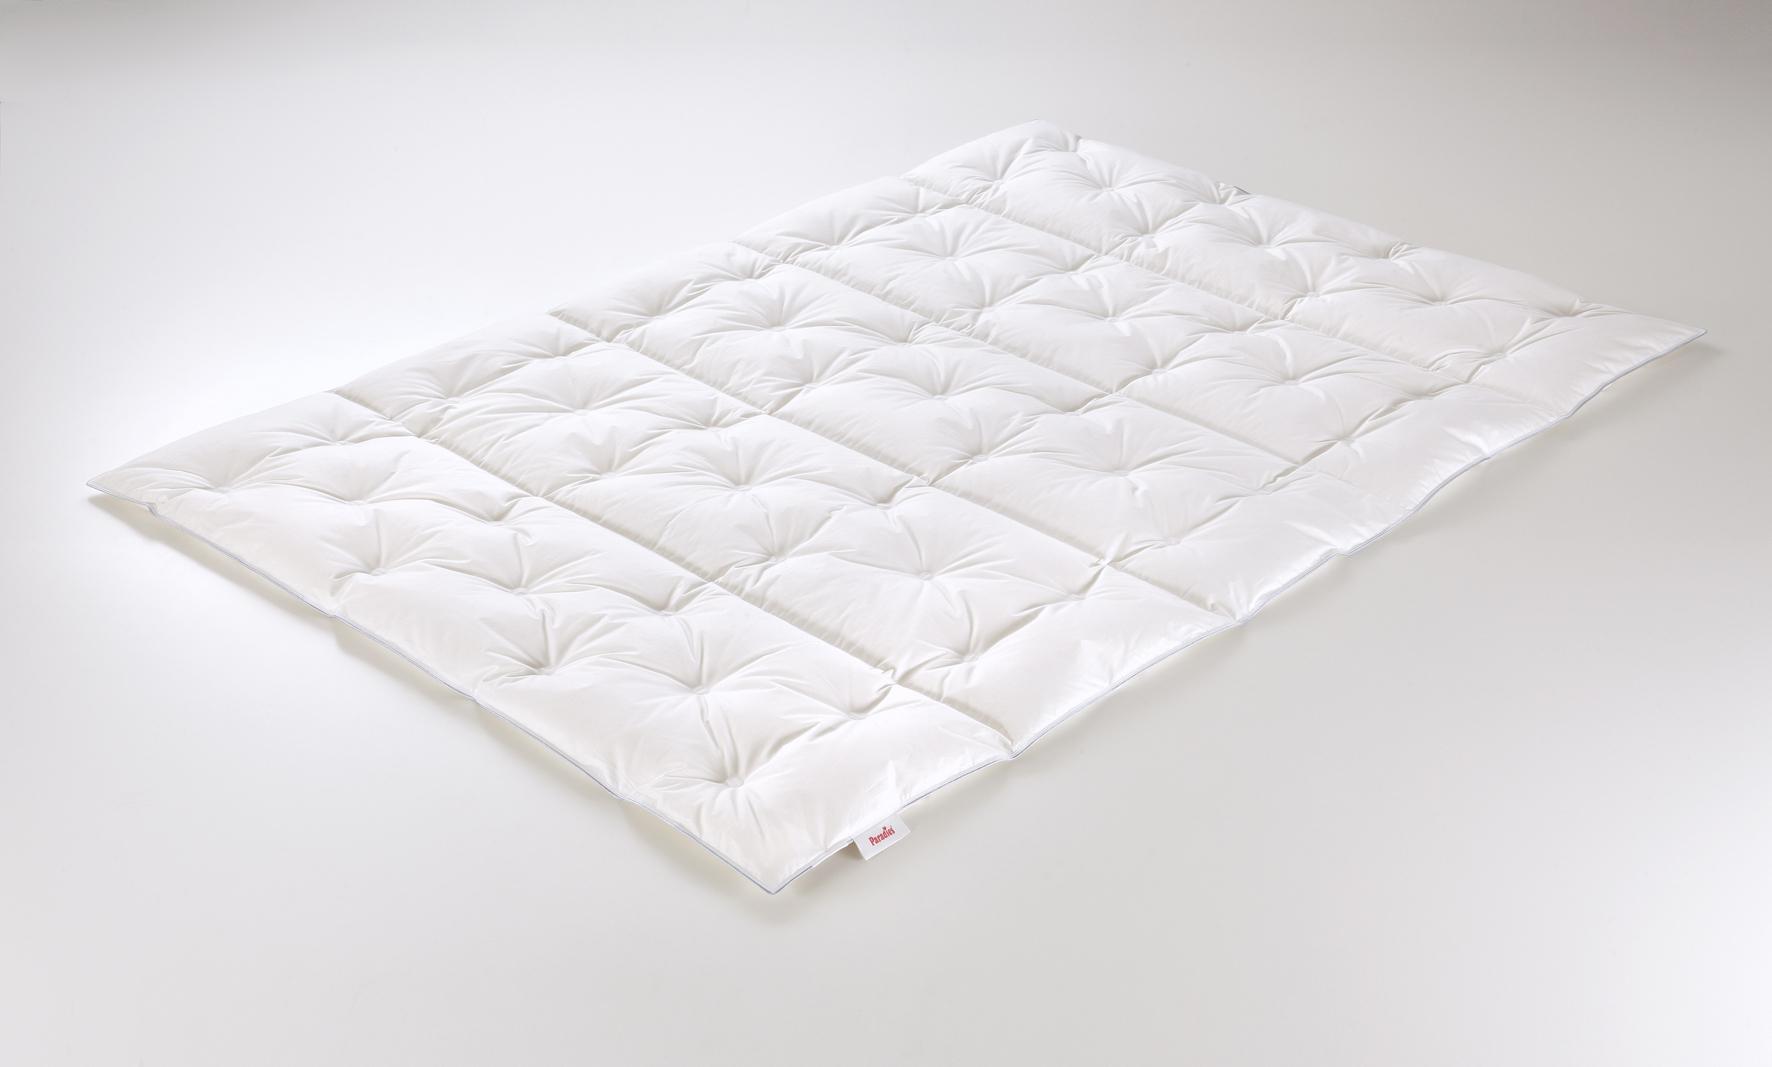 Одеяла Одеяло пуховое 135х200 Paradies Arabella Light elitnoe-odeyalo-135h200-arabella-light-ot-paradies-germaniya.jpg